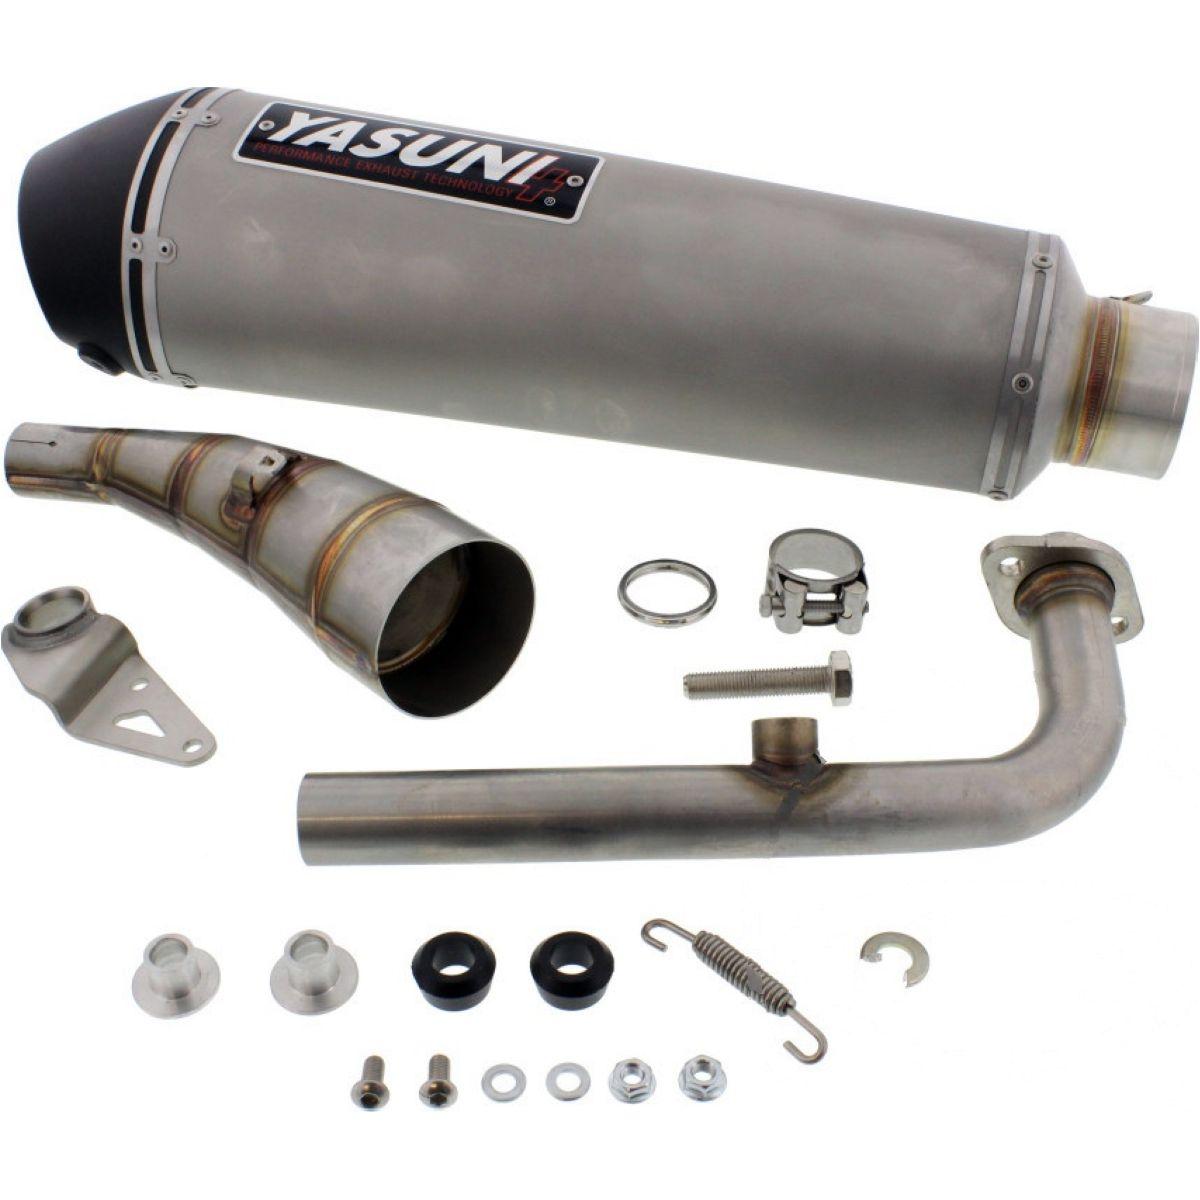 http www biketeile service de en exhaustsystemparts completesystem yasuni yasunicompleteexhaustsystemtub1202 html